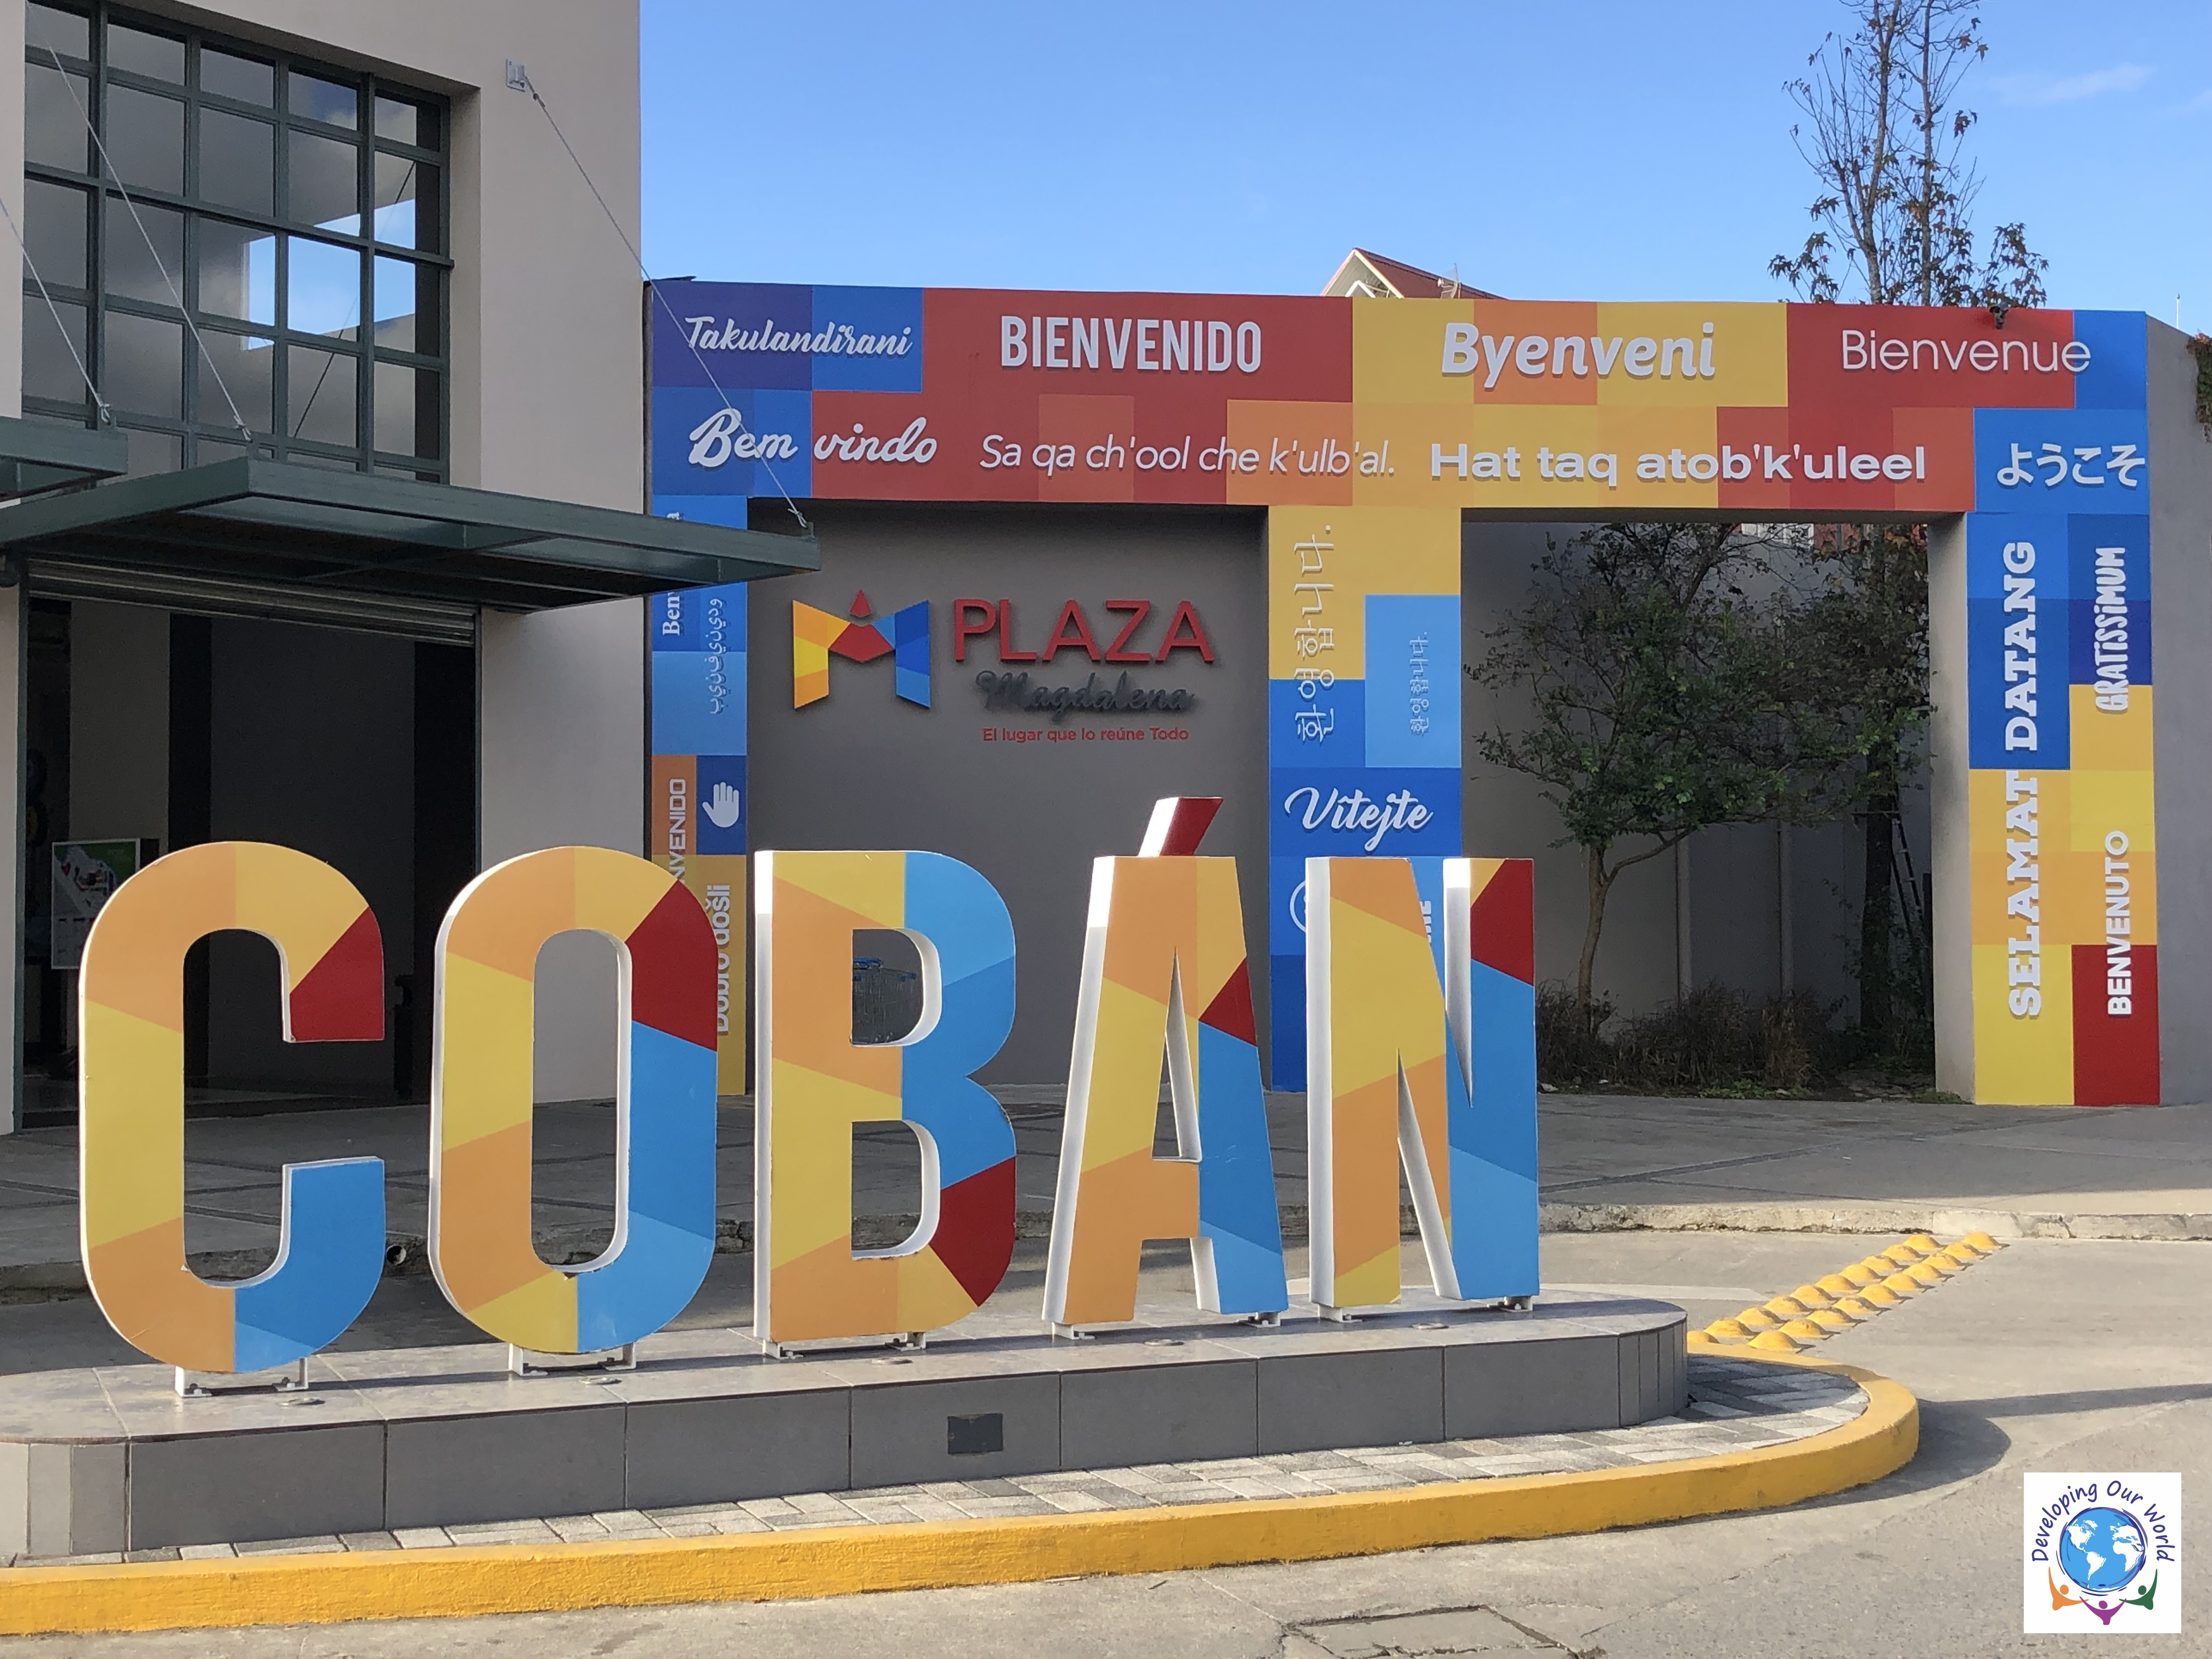 The Coban sign